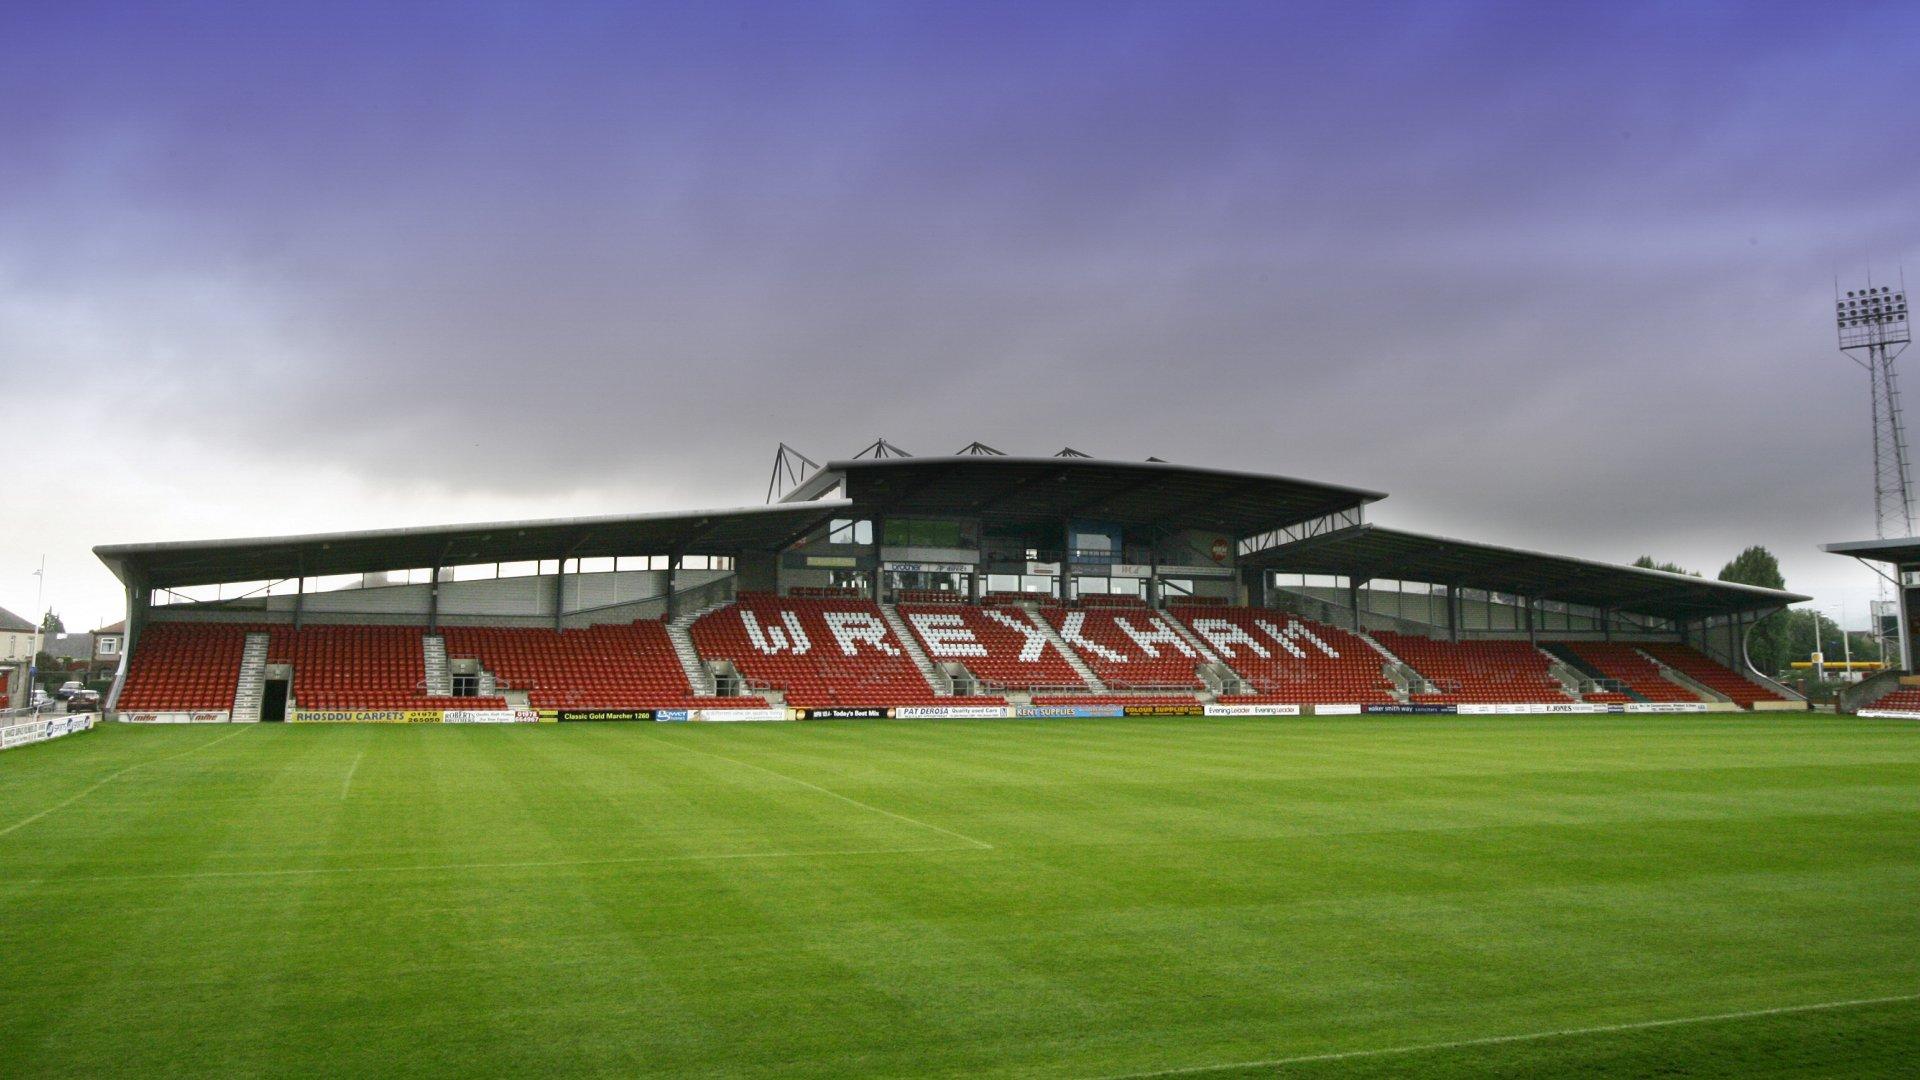 Wrexham F.C. (Football Club) Of The English Football